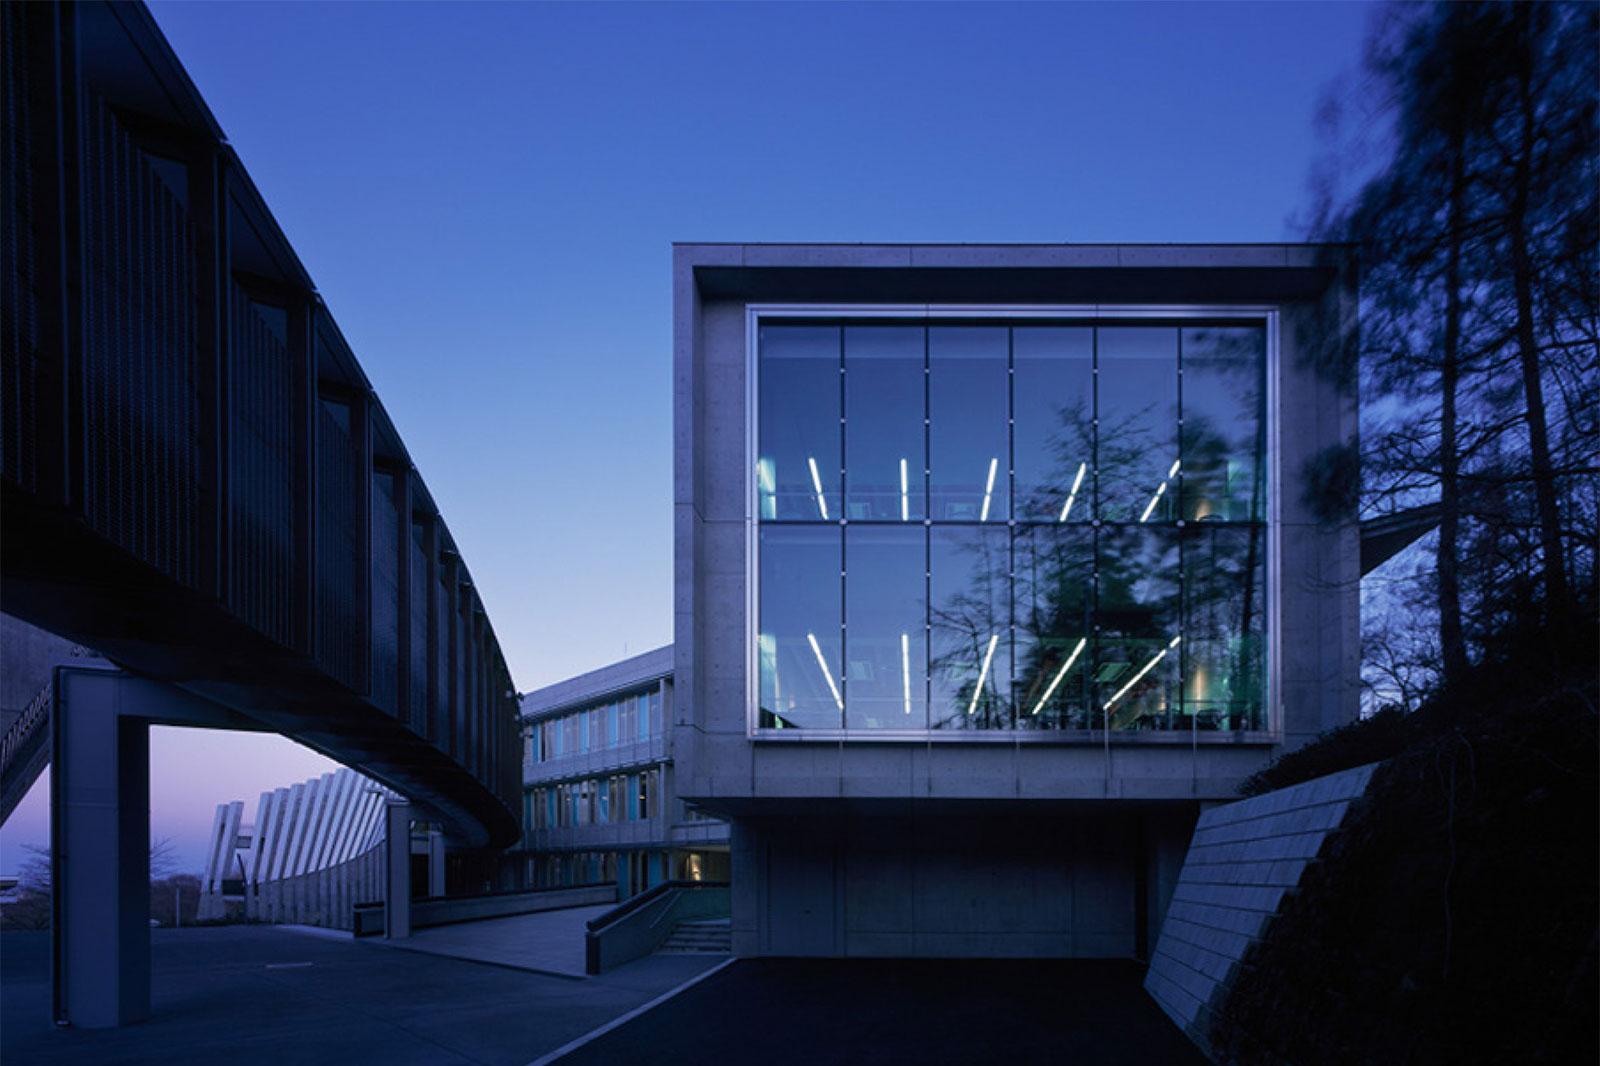 大東文化大学 東松山キャンパス2号館